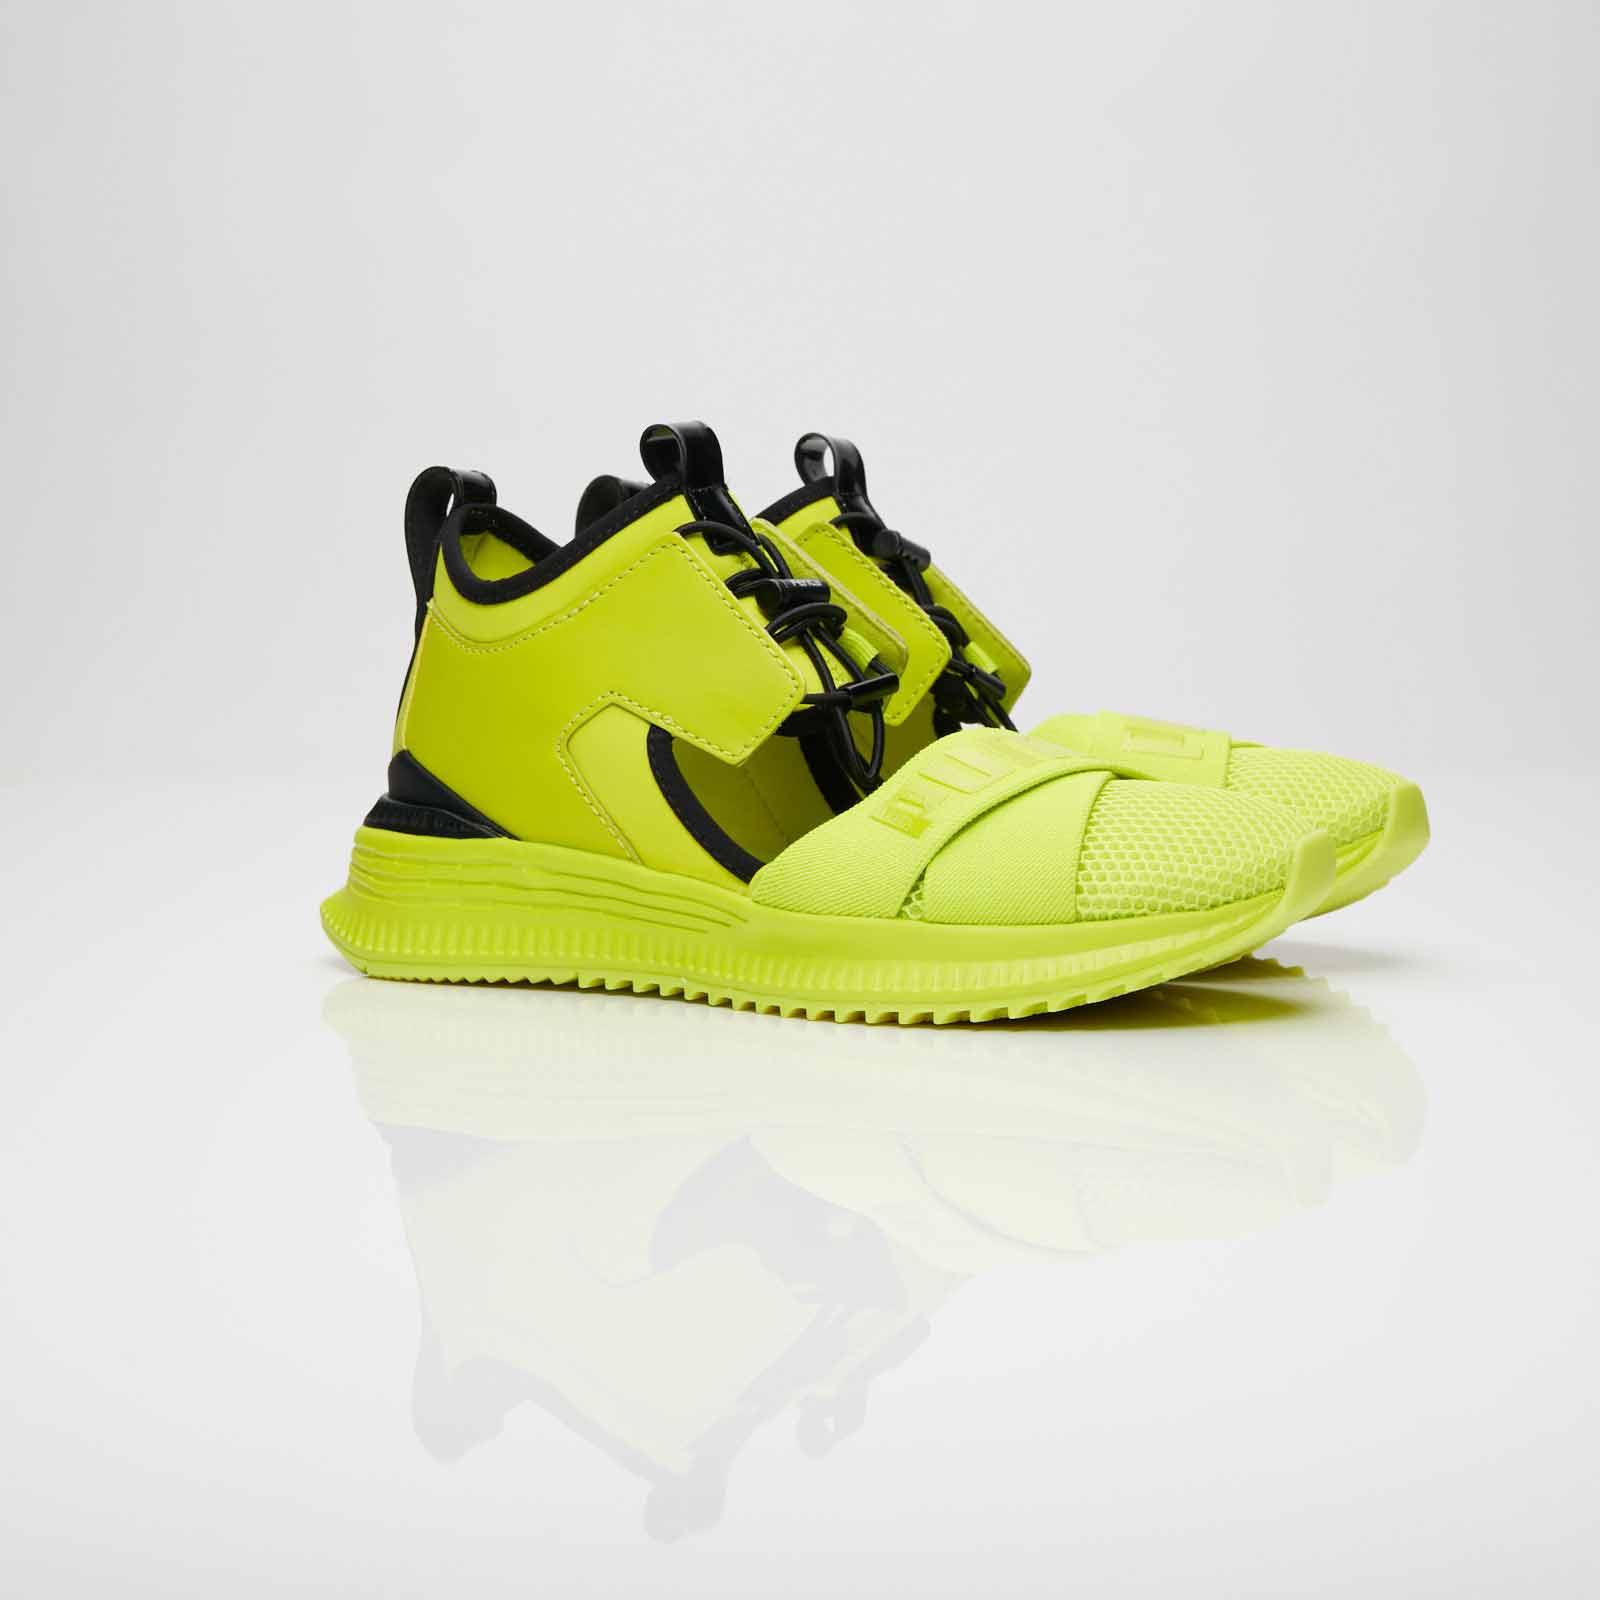 more photos 3237f cbf67 Puma Fenty Avid Wns - 367683-03 - Sneakersnstuff | sneakers ...